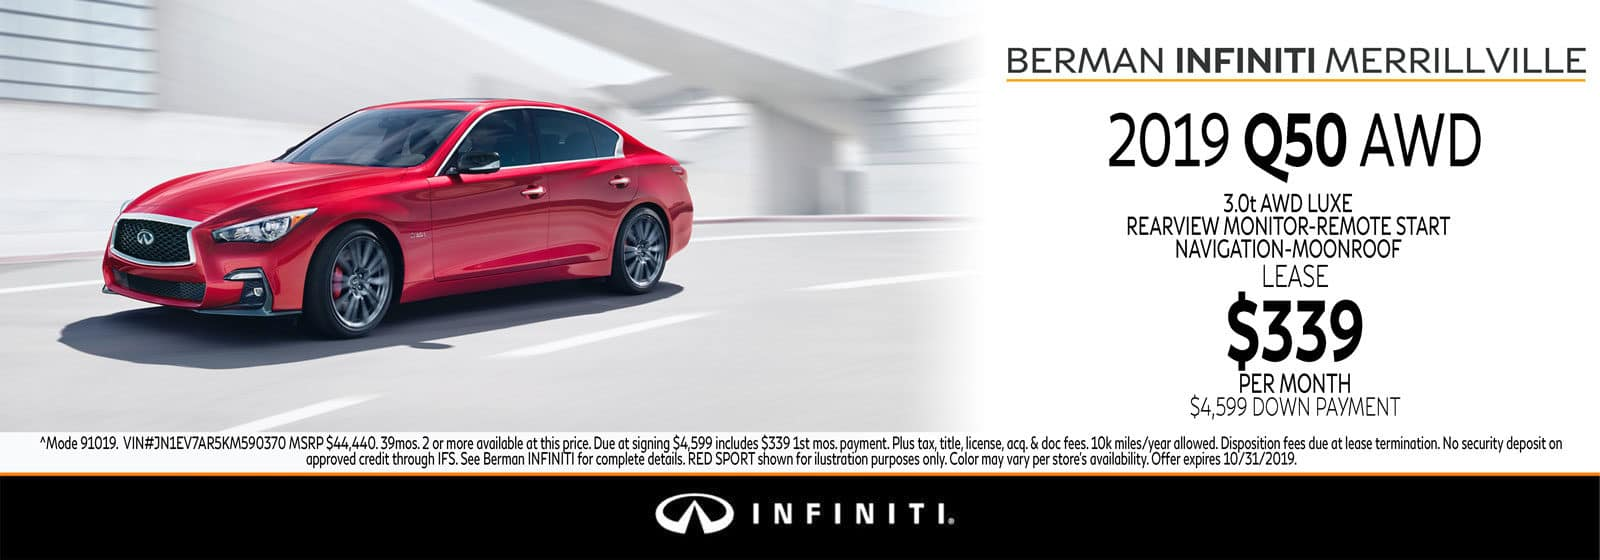 New 2019 INFINITI Q50 October Offer at Berman INFINITI of Merrillville!